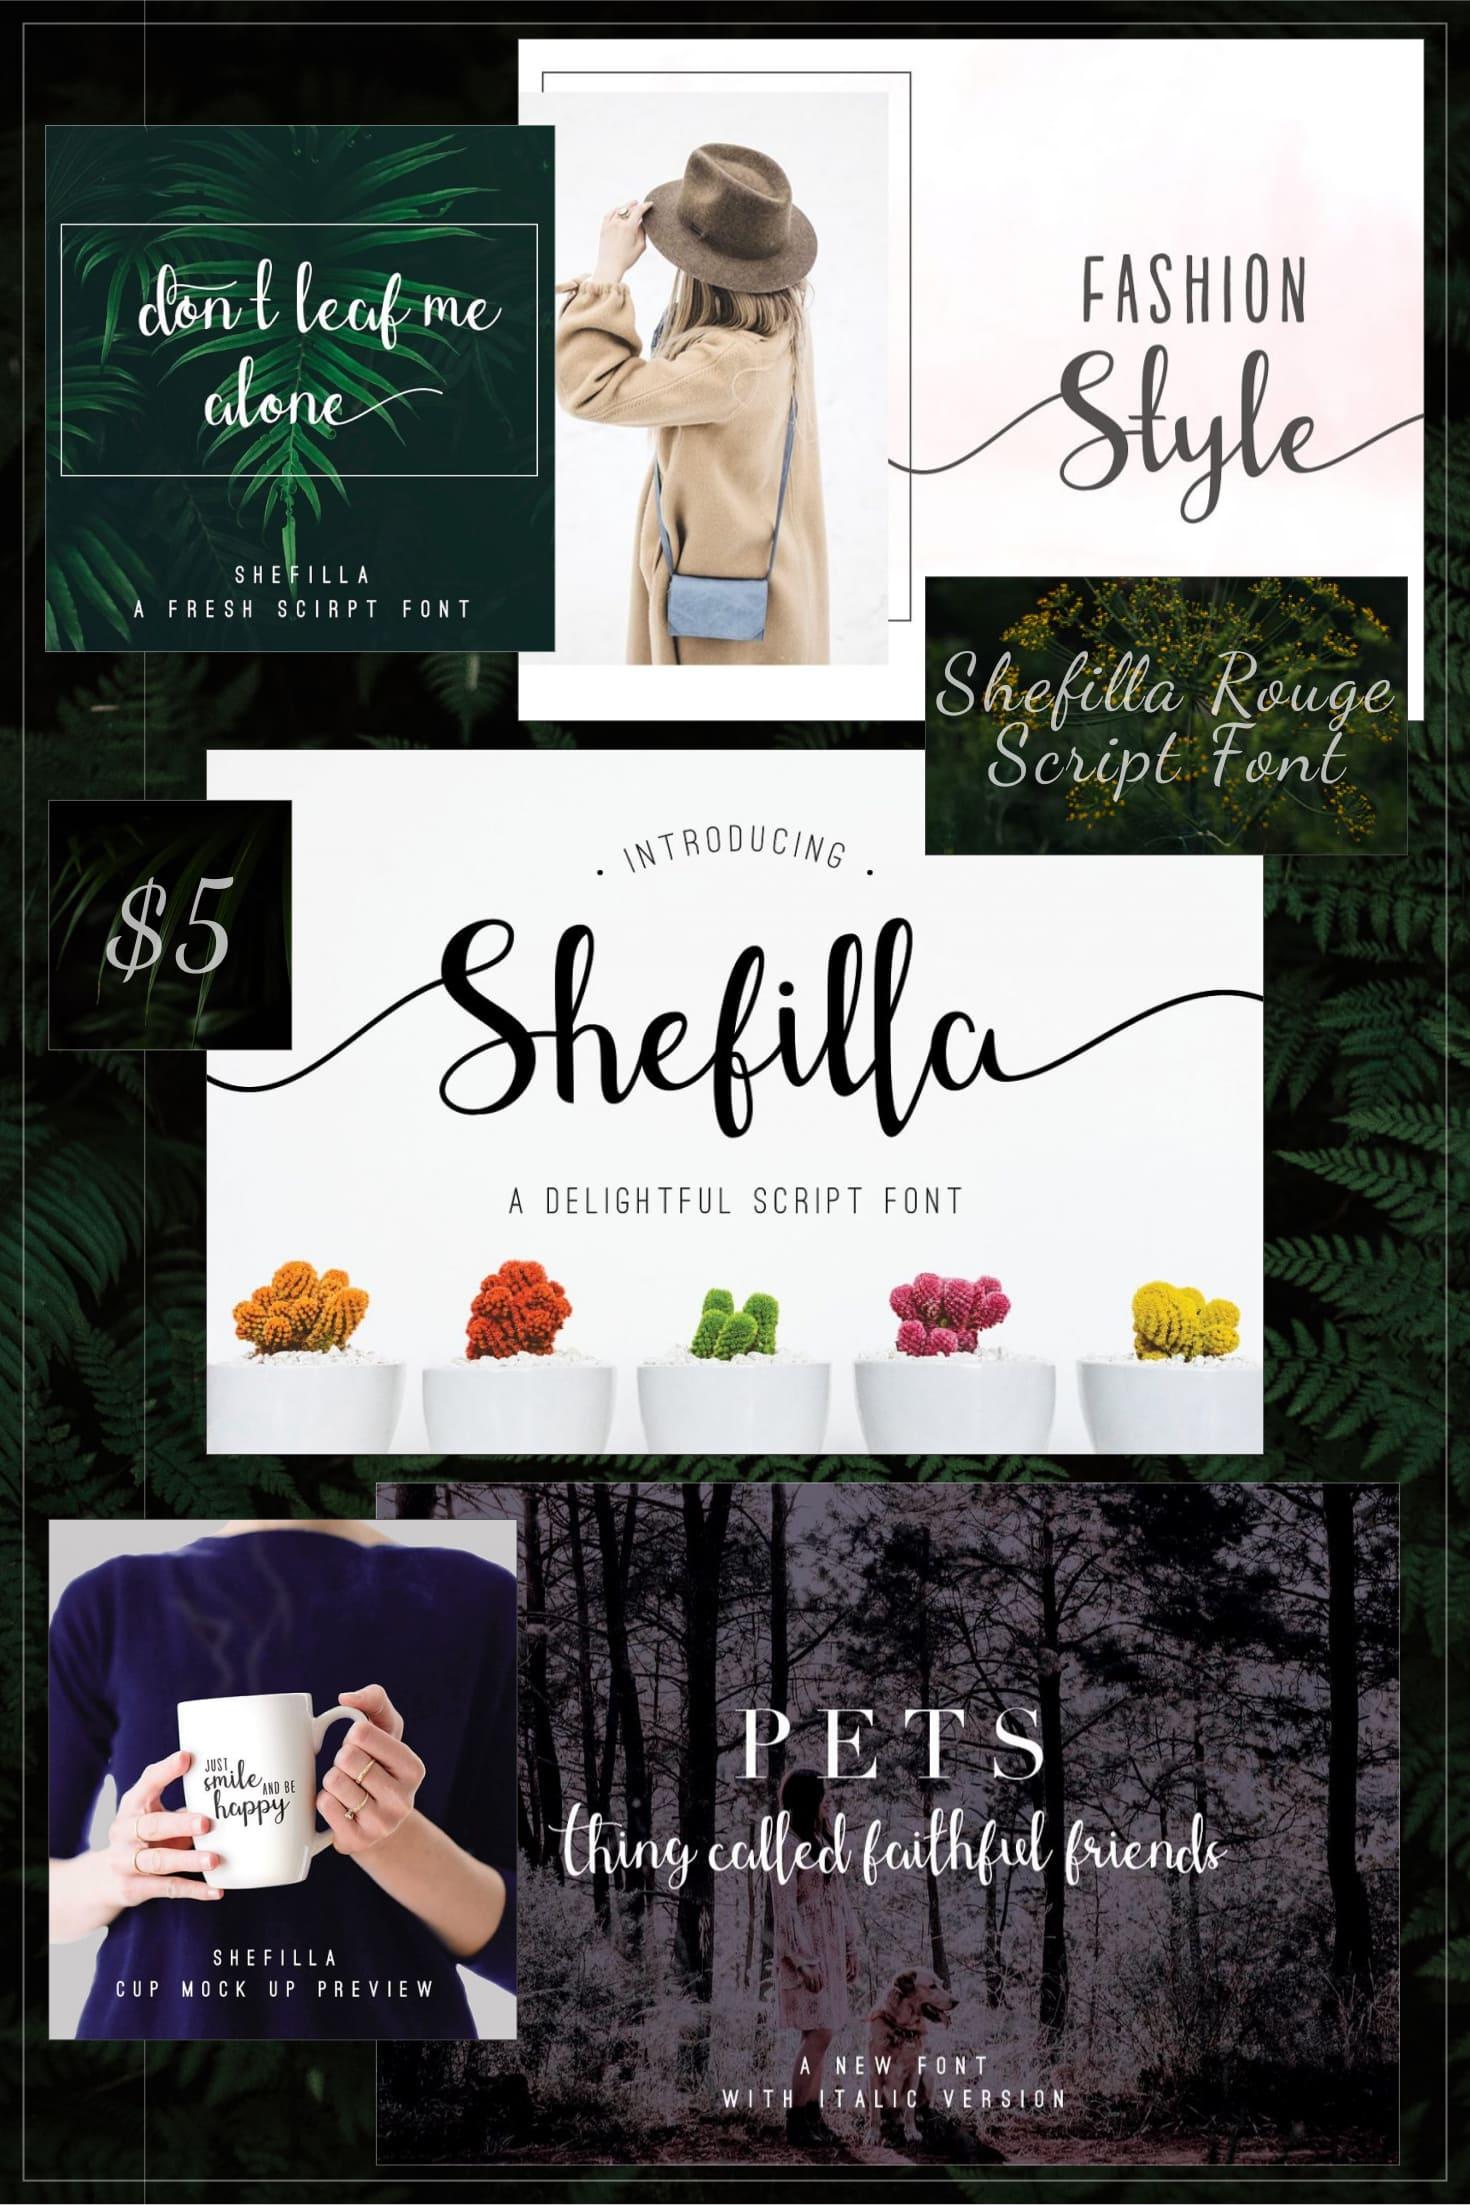 Pinterest Image: Shefilla Rouge Script Font.